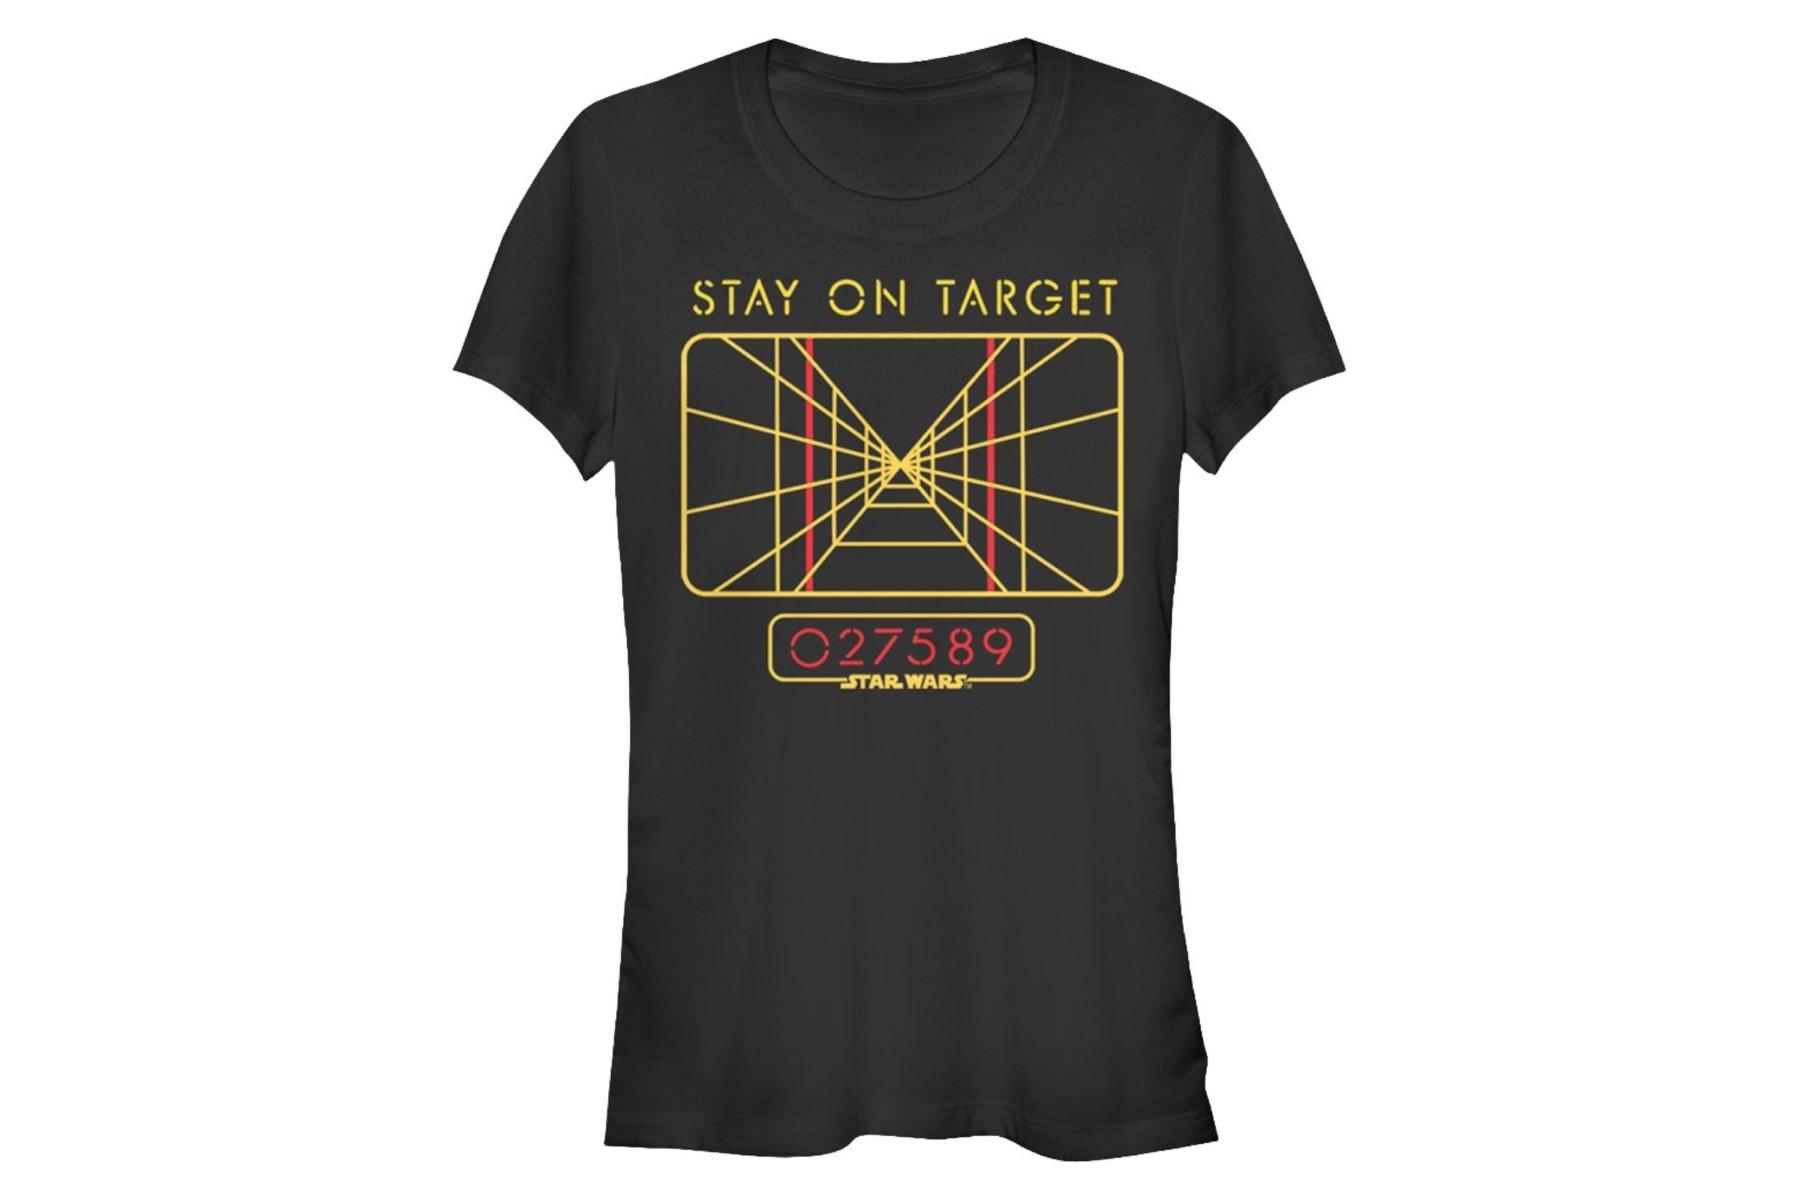 Black t shirt target - 80 S Tees Fifth Sun Women S Stay On Target T Shirt